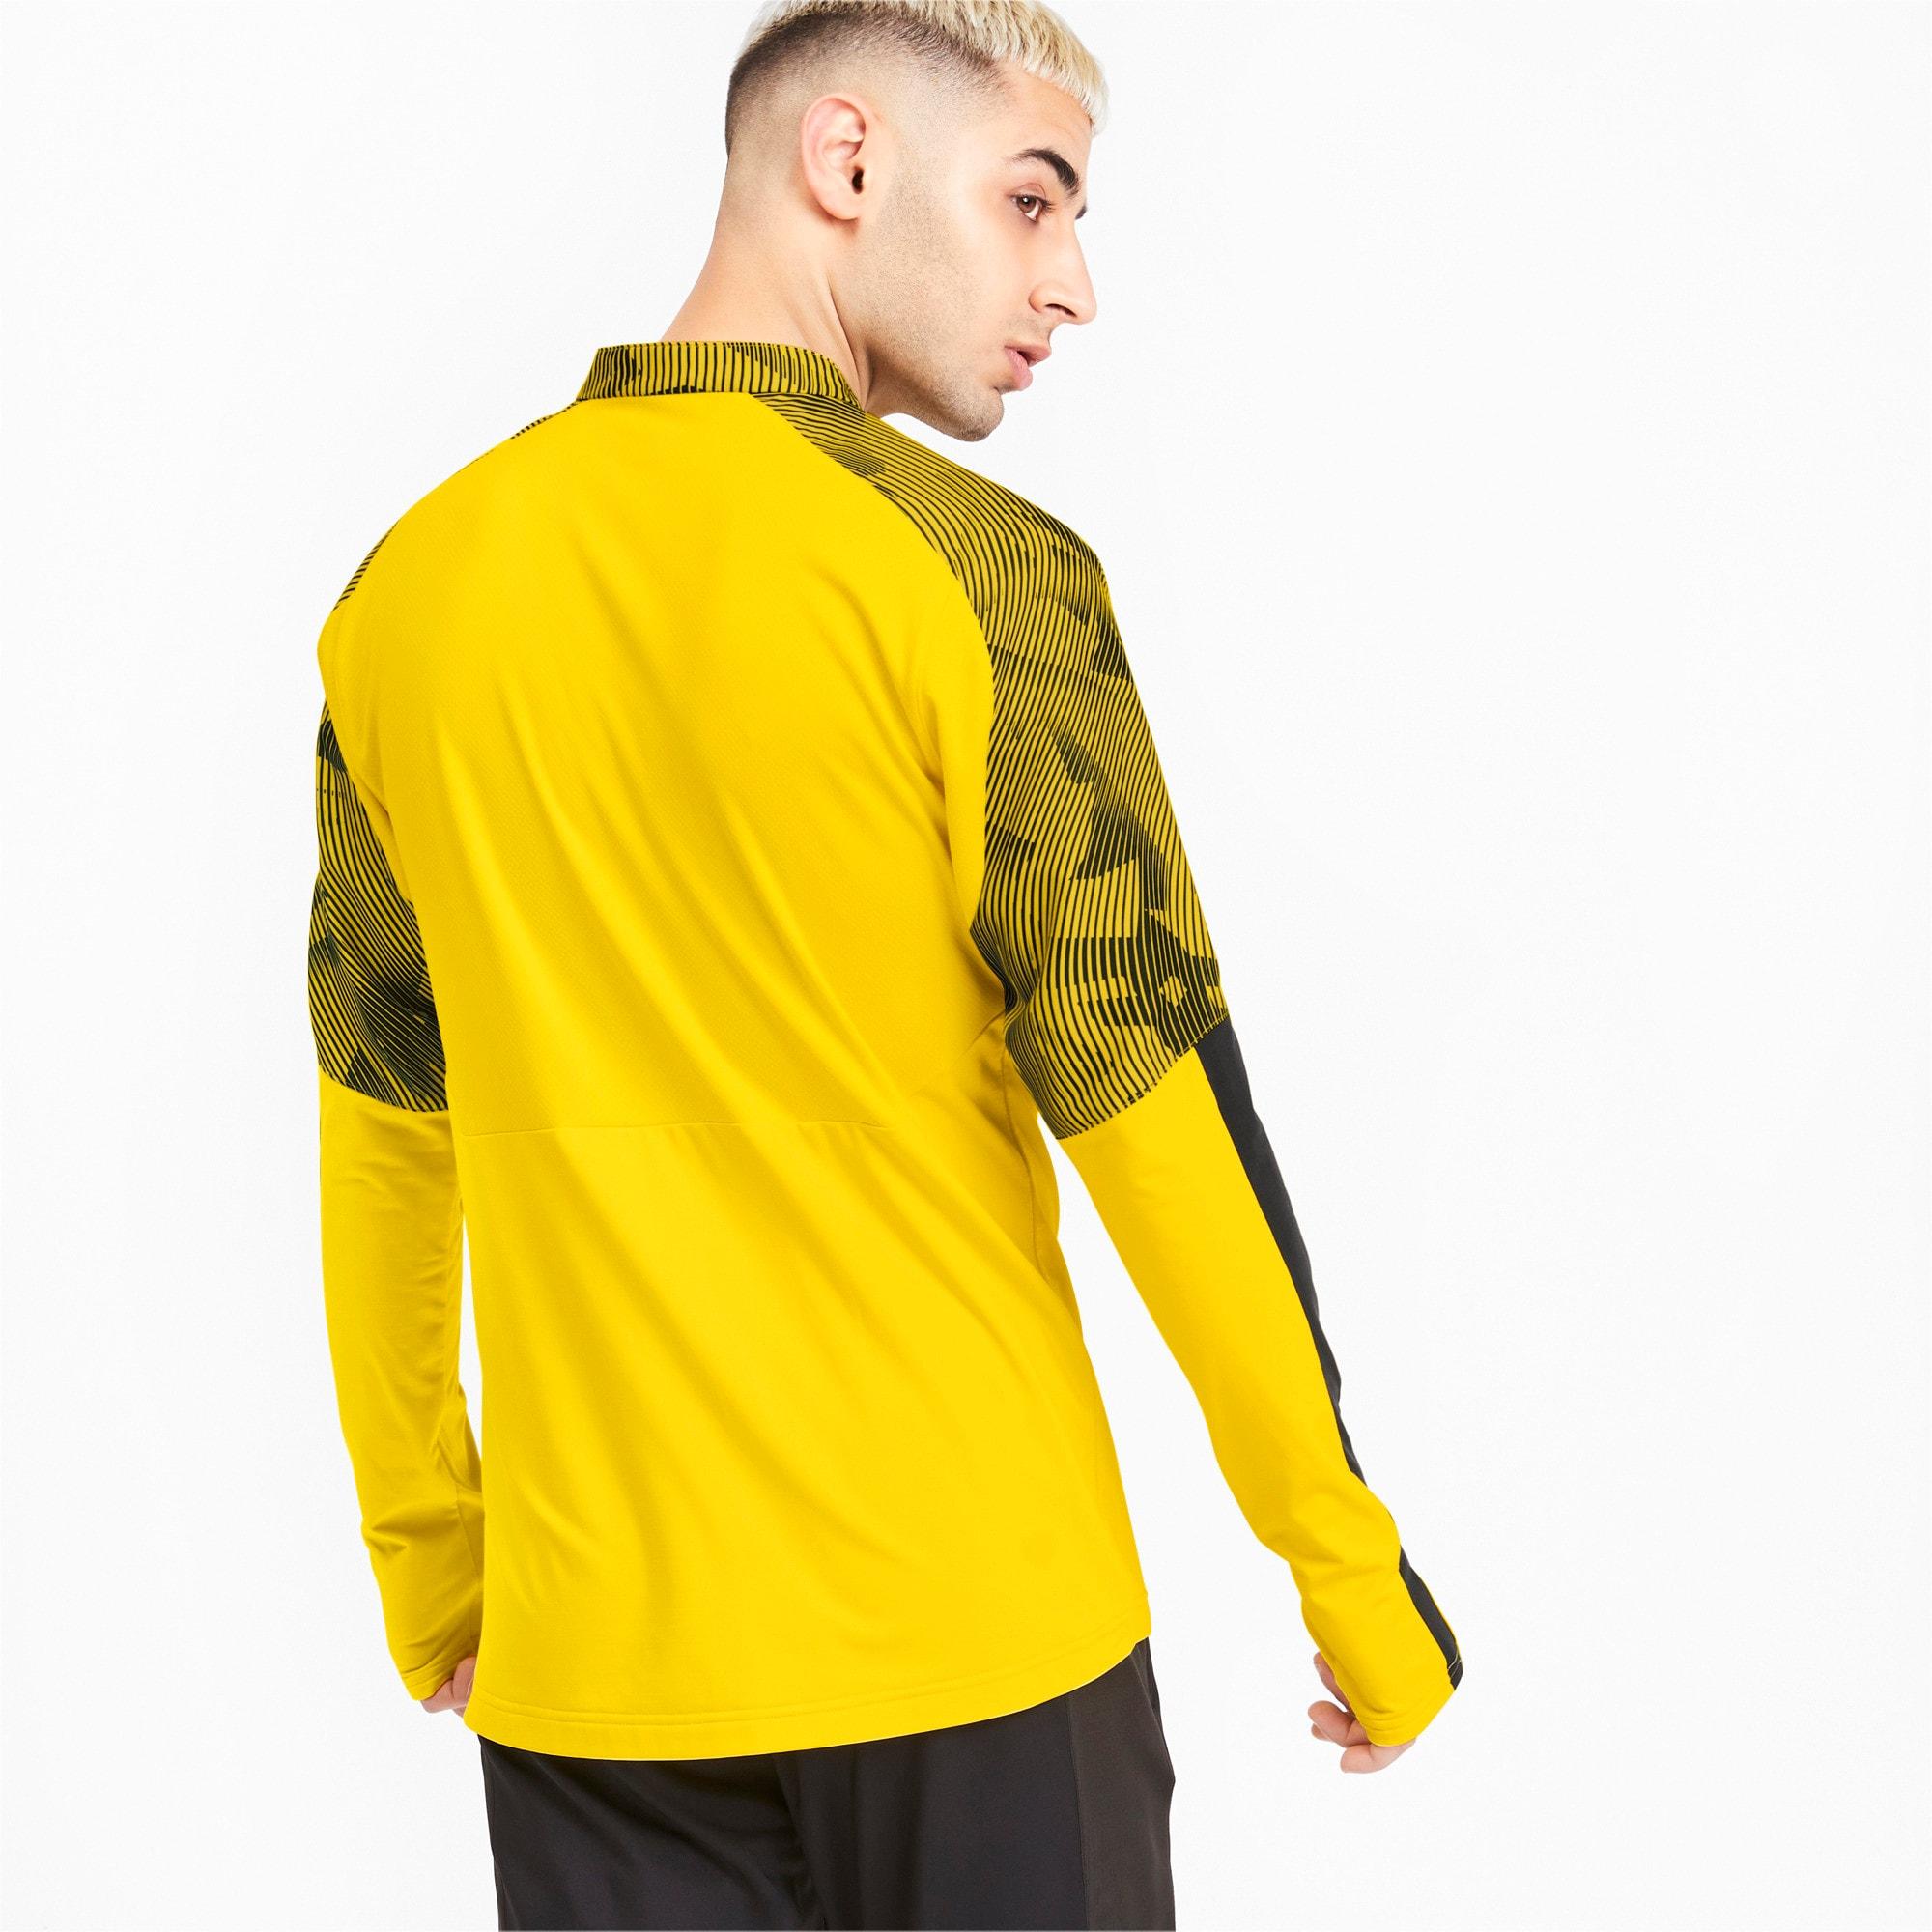 Thumbnail 2 of BVB Men's 1/4 Zip Training Top, Cyber Yellow-Puma Black, medium